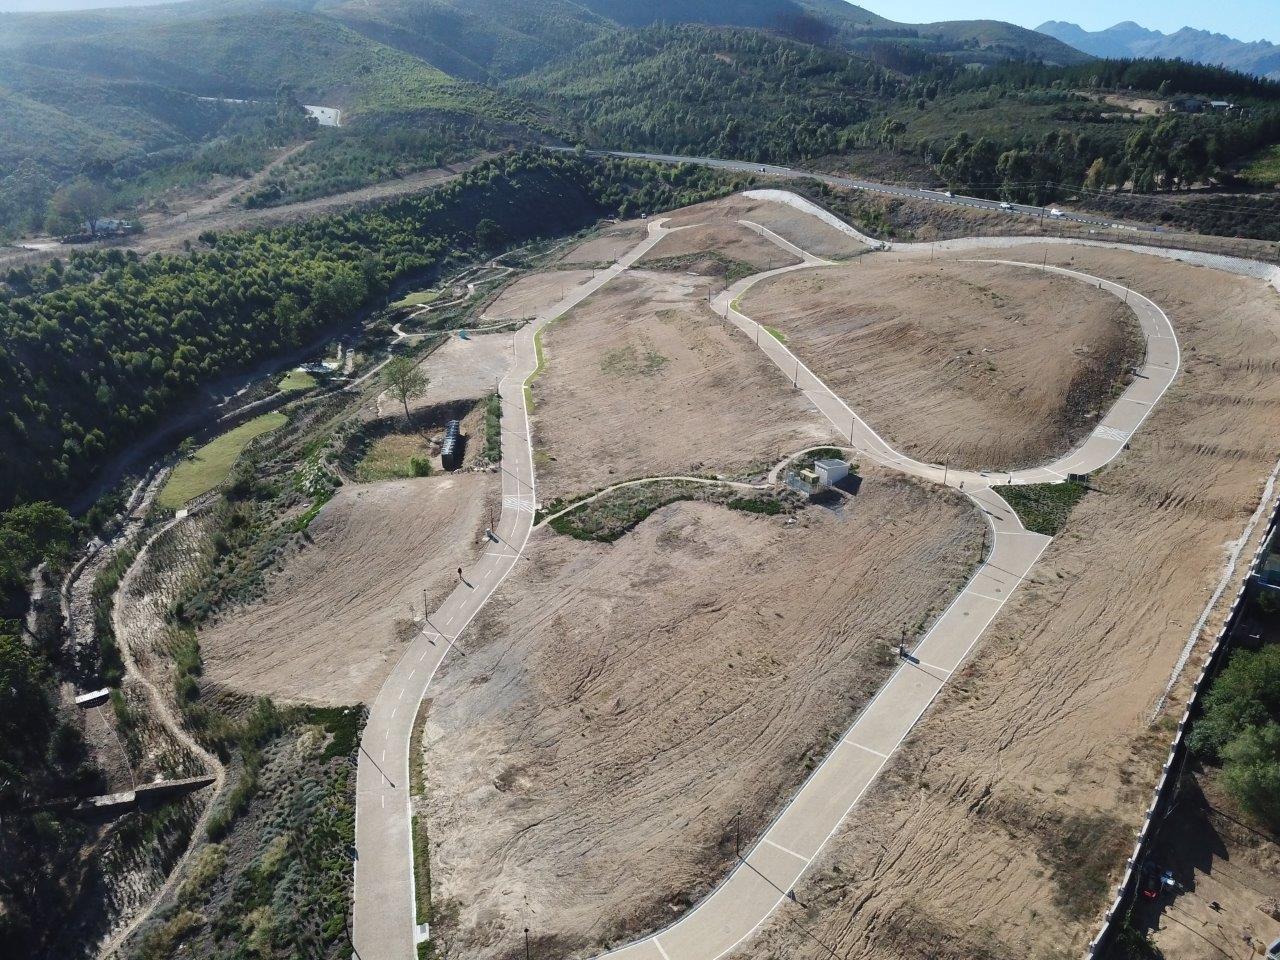 Vacant Land / Plot in Stellenbosch Central For Sale